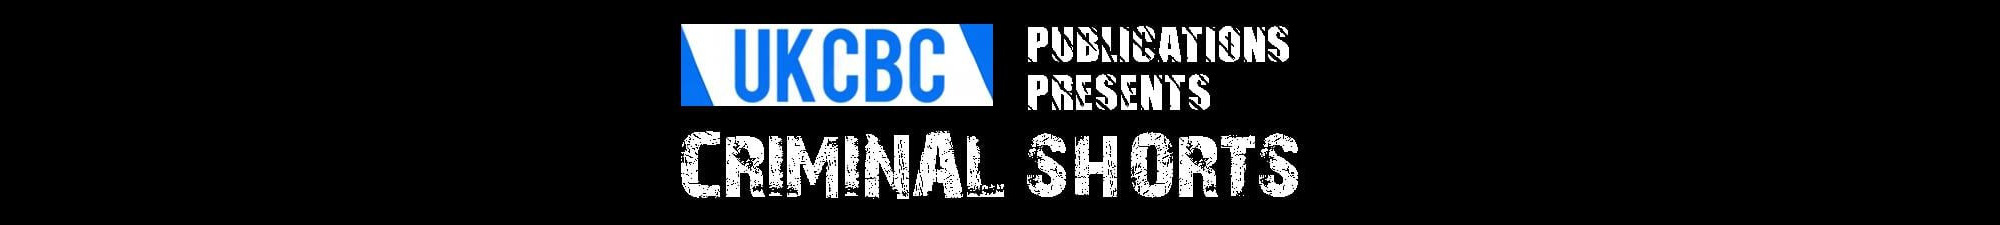 Pre-Order The UK Crime Book Club Anthology